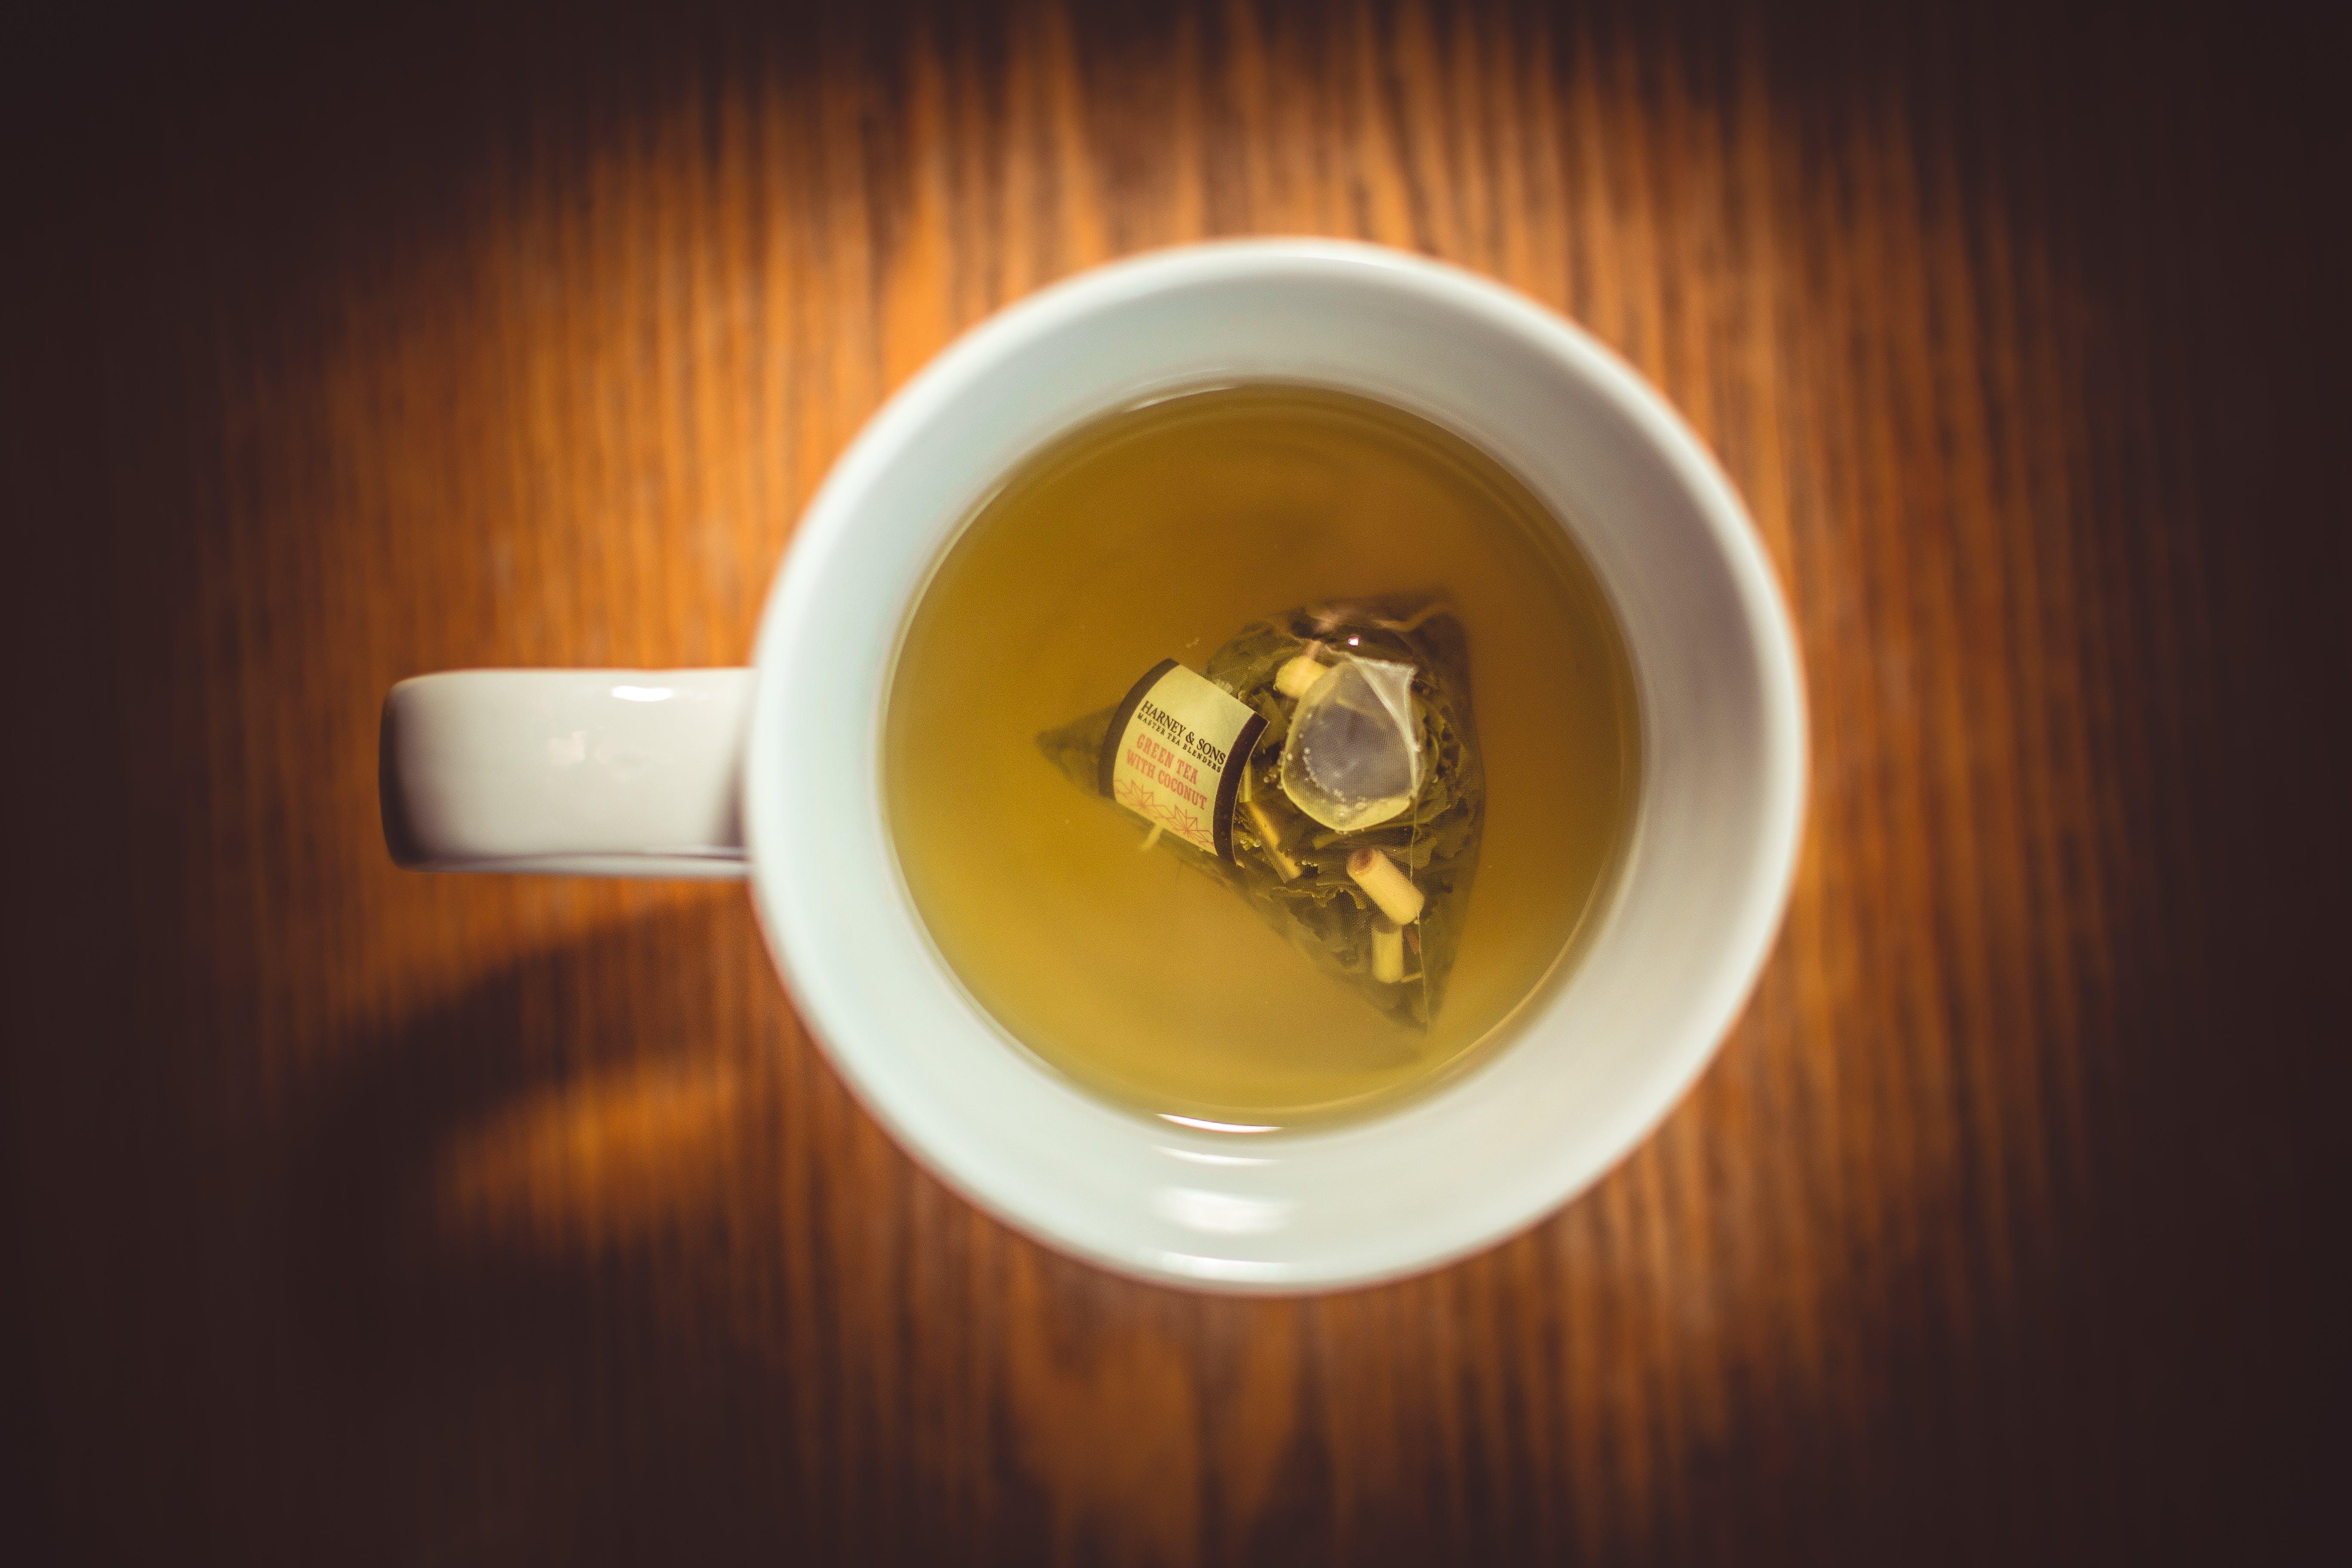 Free stock photo of mug, drink, tea, blur